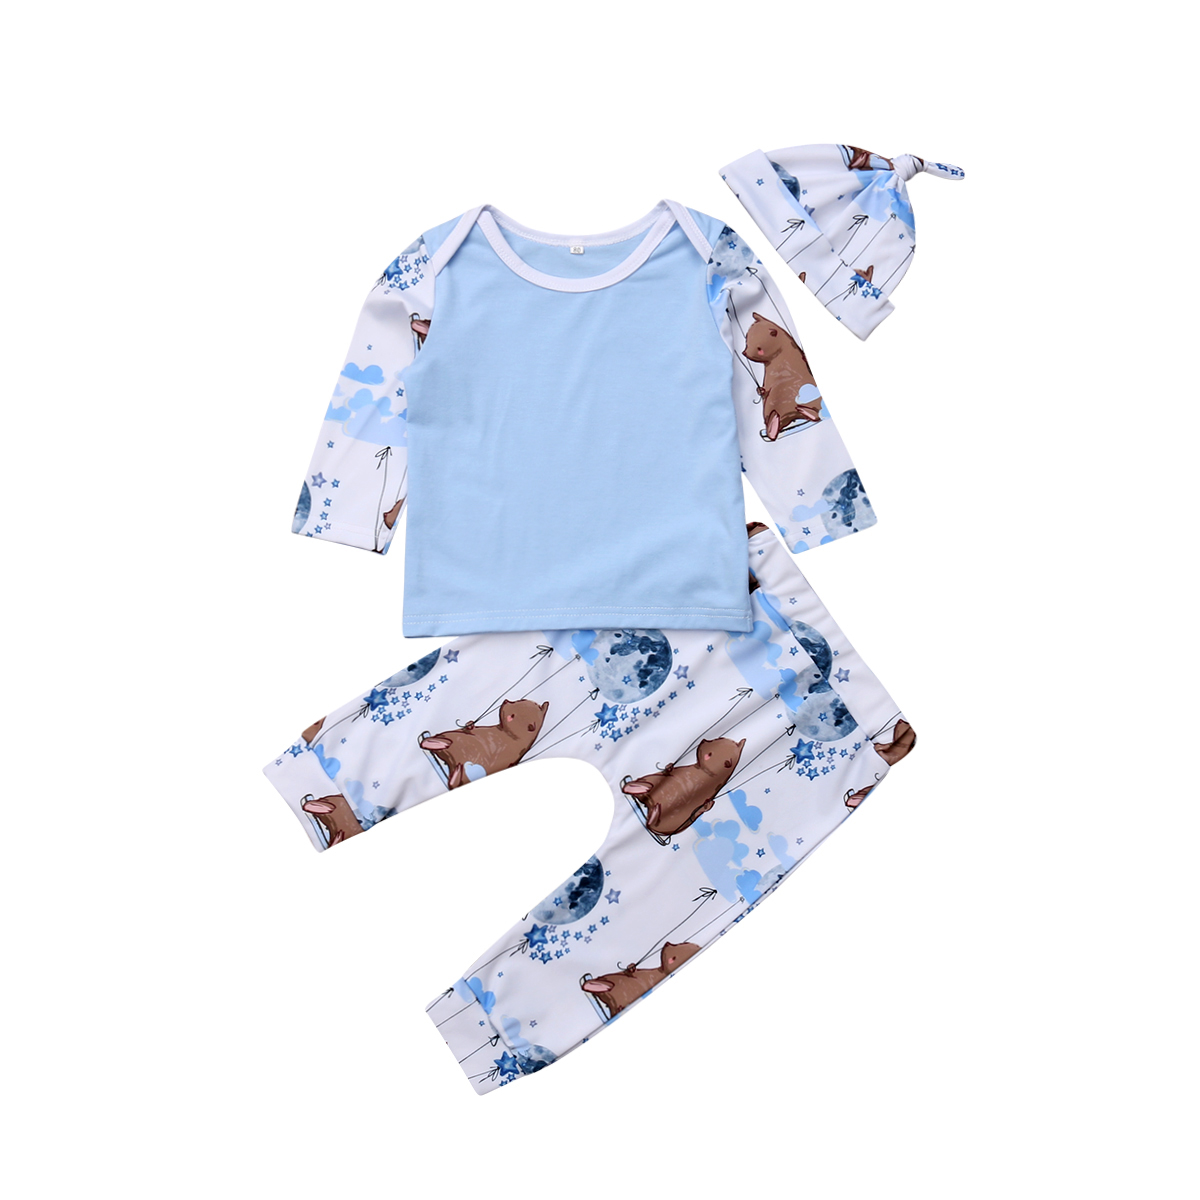 Baby Clothes 3-18M Infant Newborn Boy Girl Long Sleeve Cotton T-shirt Tops Cartoon Animal Print Long Pant Hat 3PCS Autumn Set